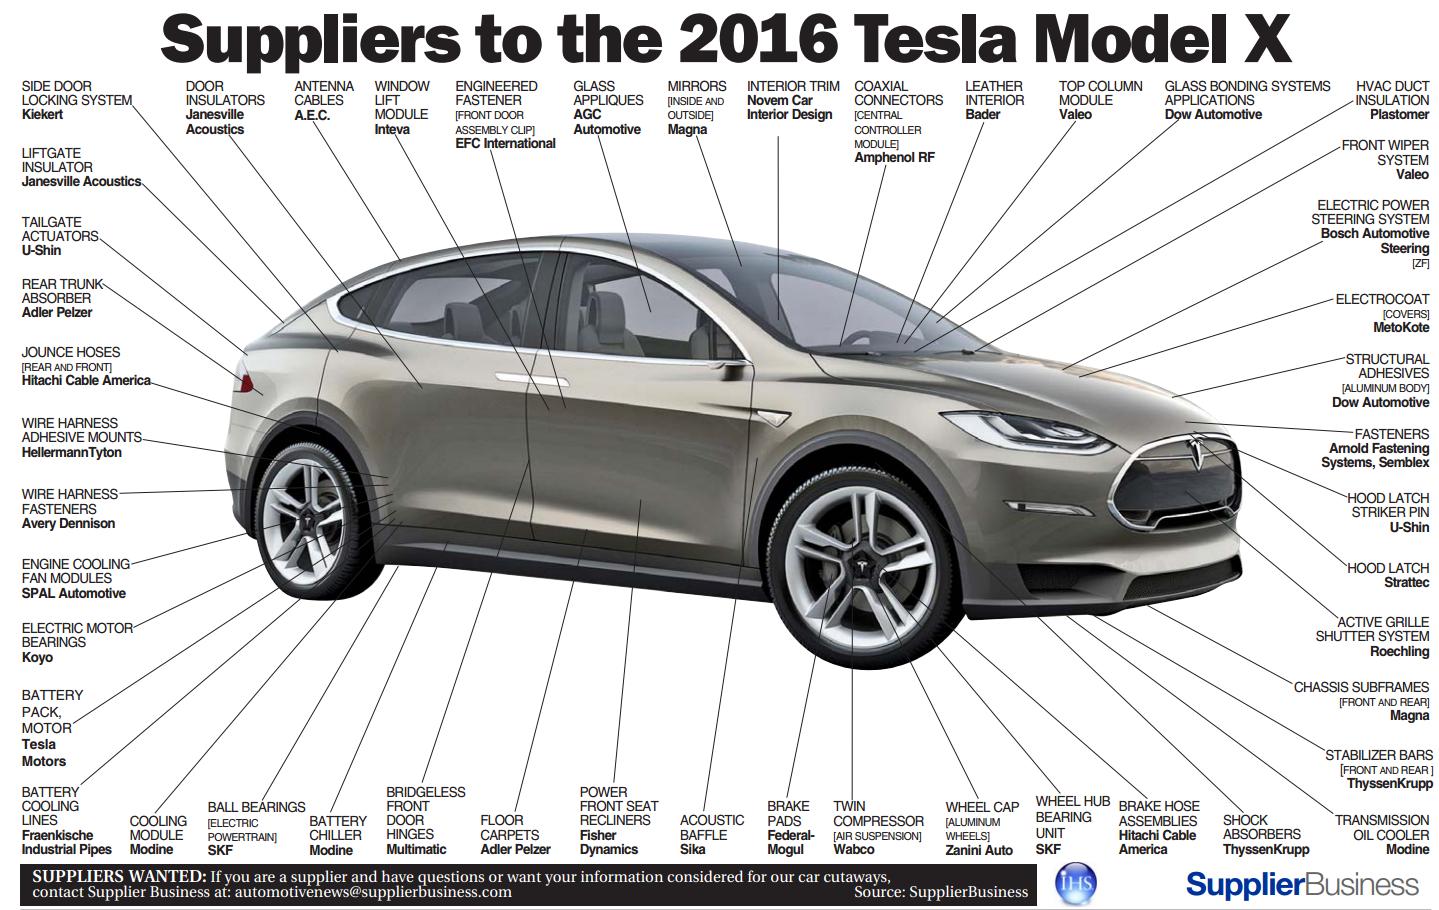 Single suppliers to Tesla Model X